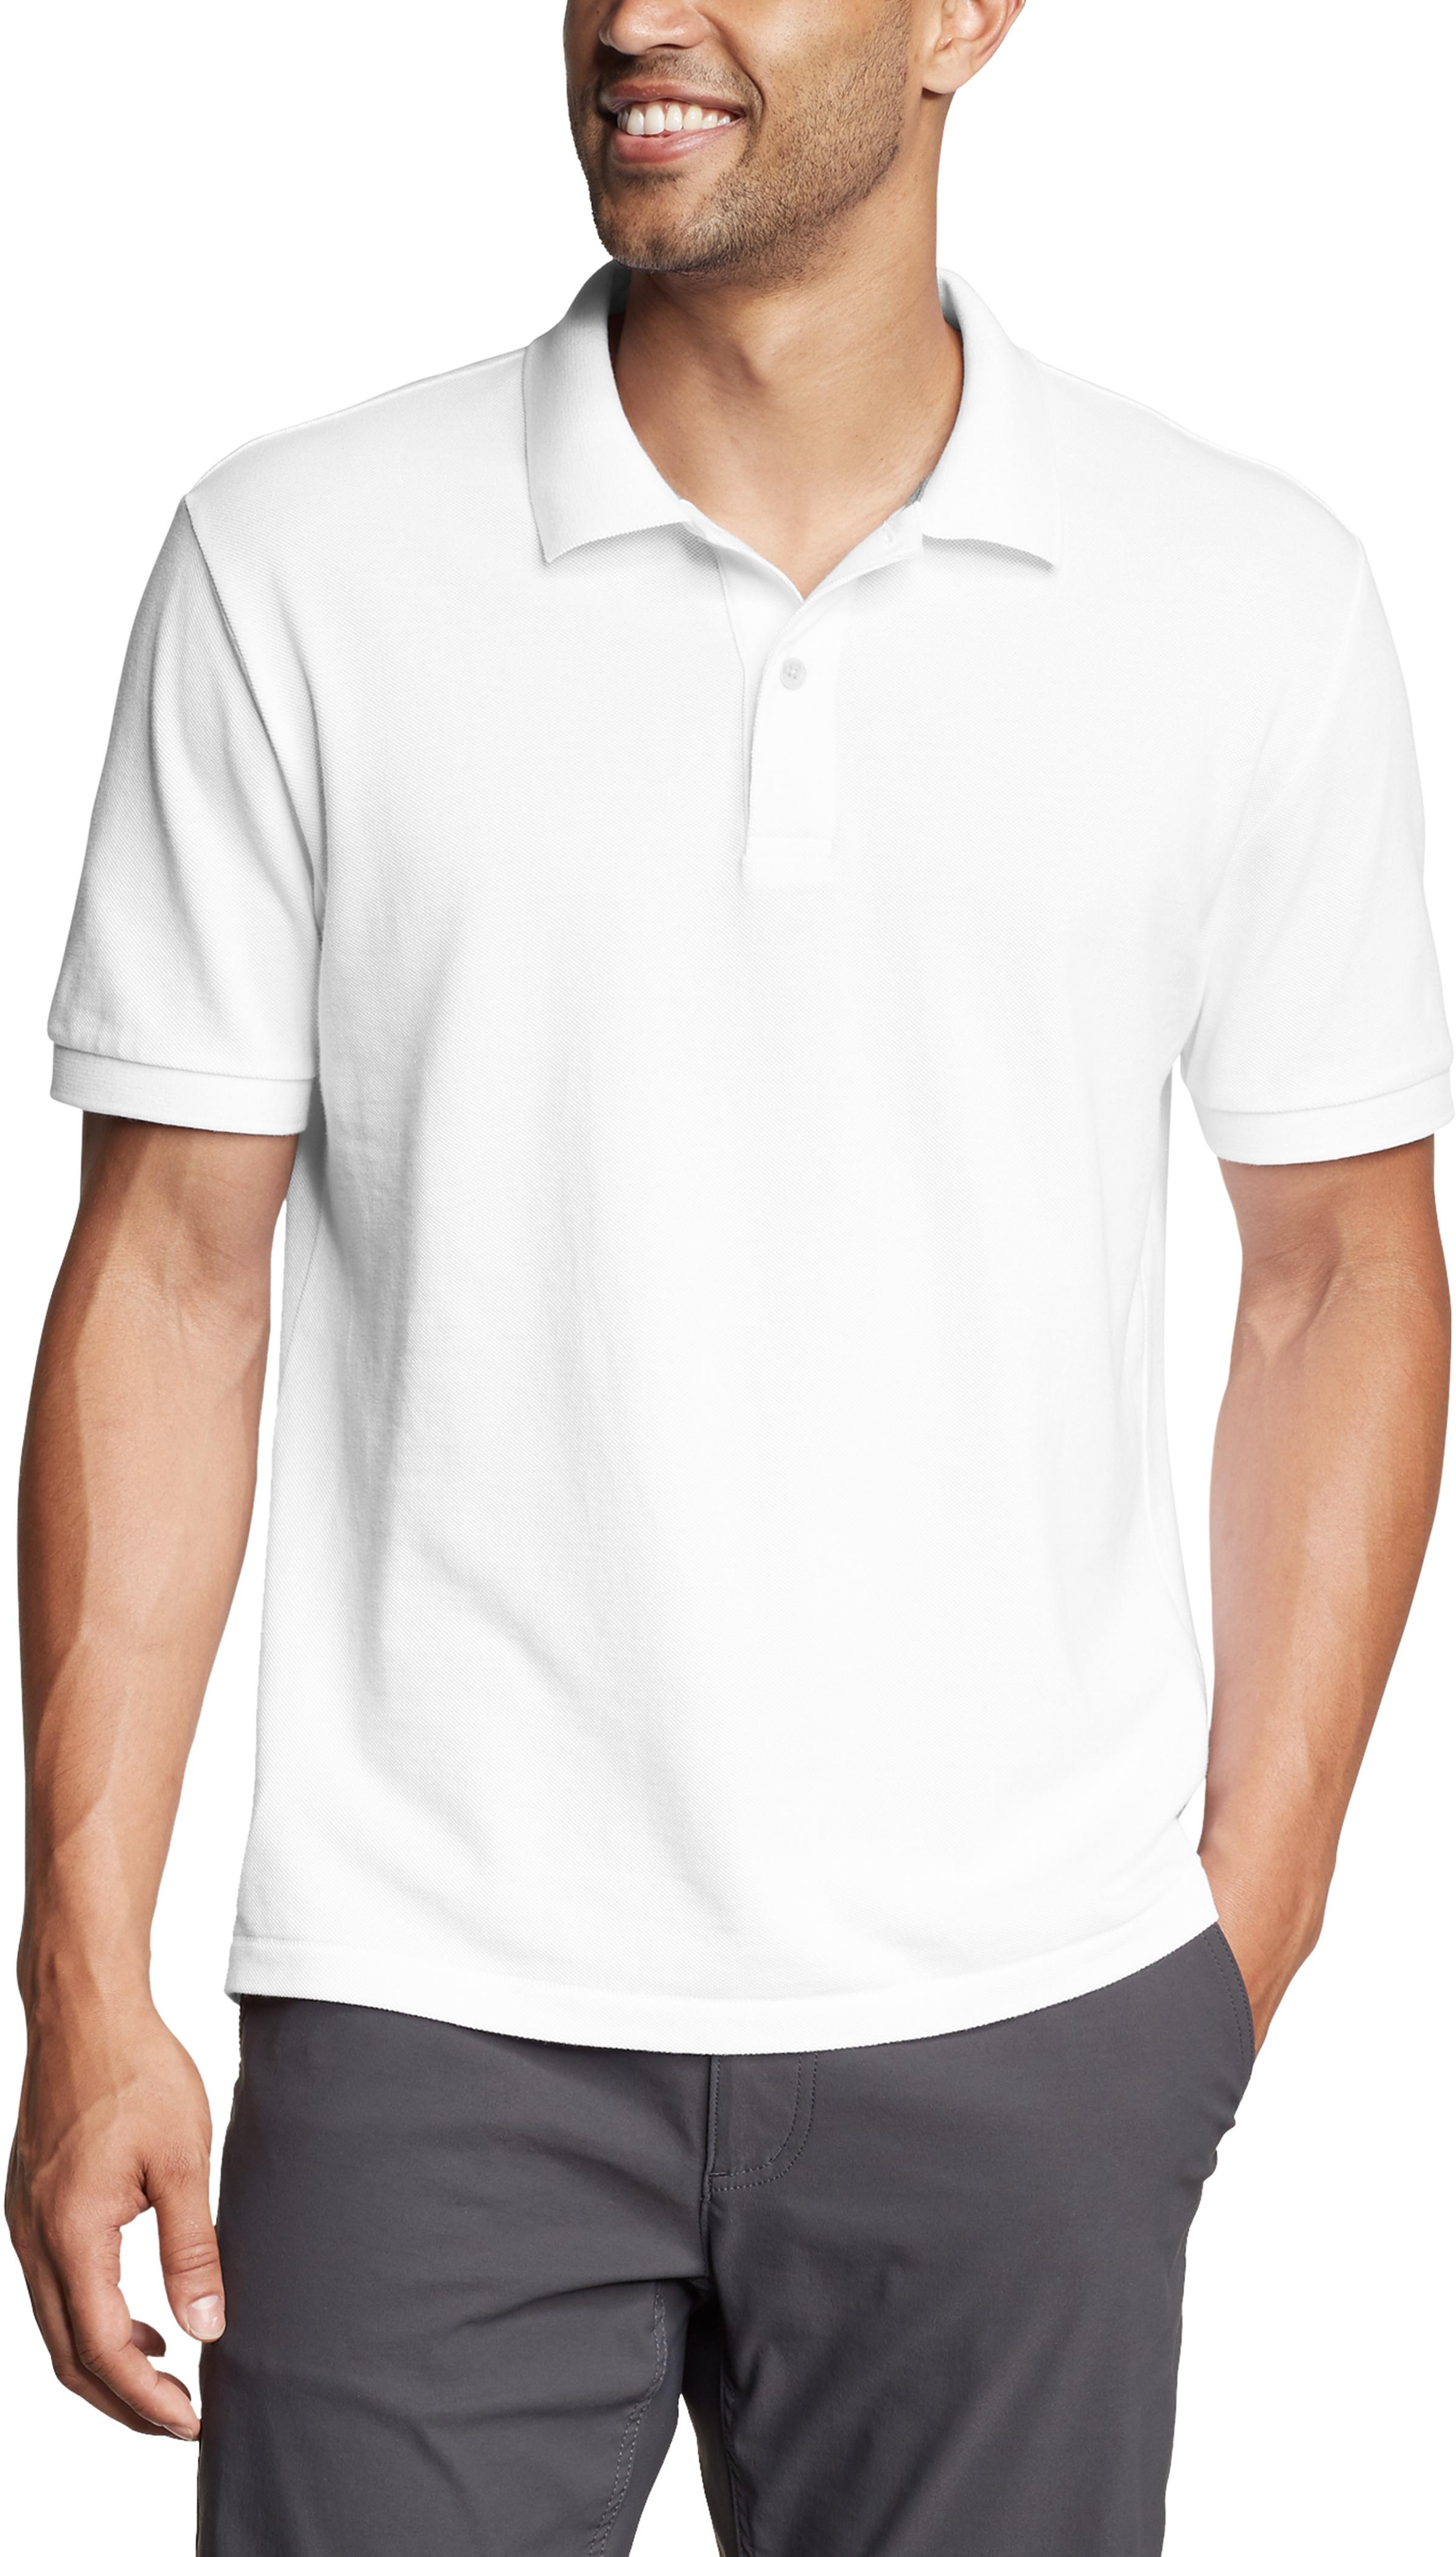 Рубашка поло Classic Field Pro с коротким рукавом - высокий Eddie Bauer